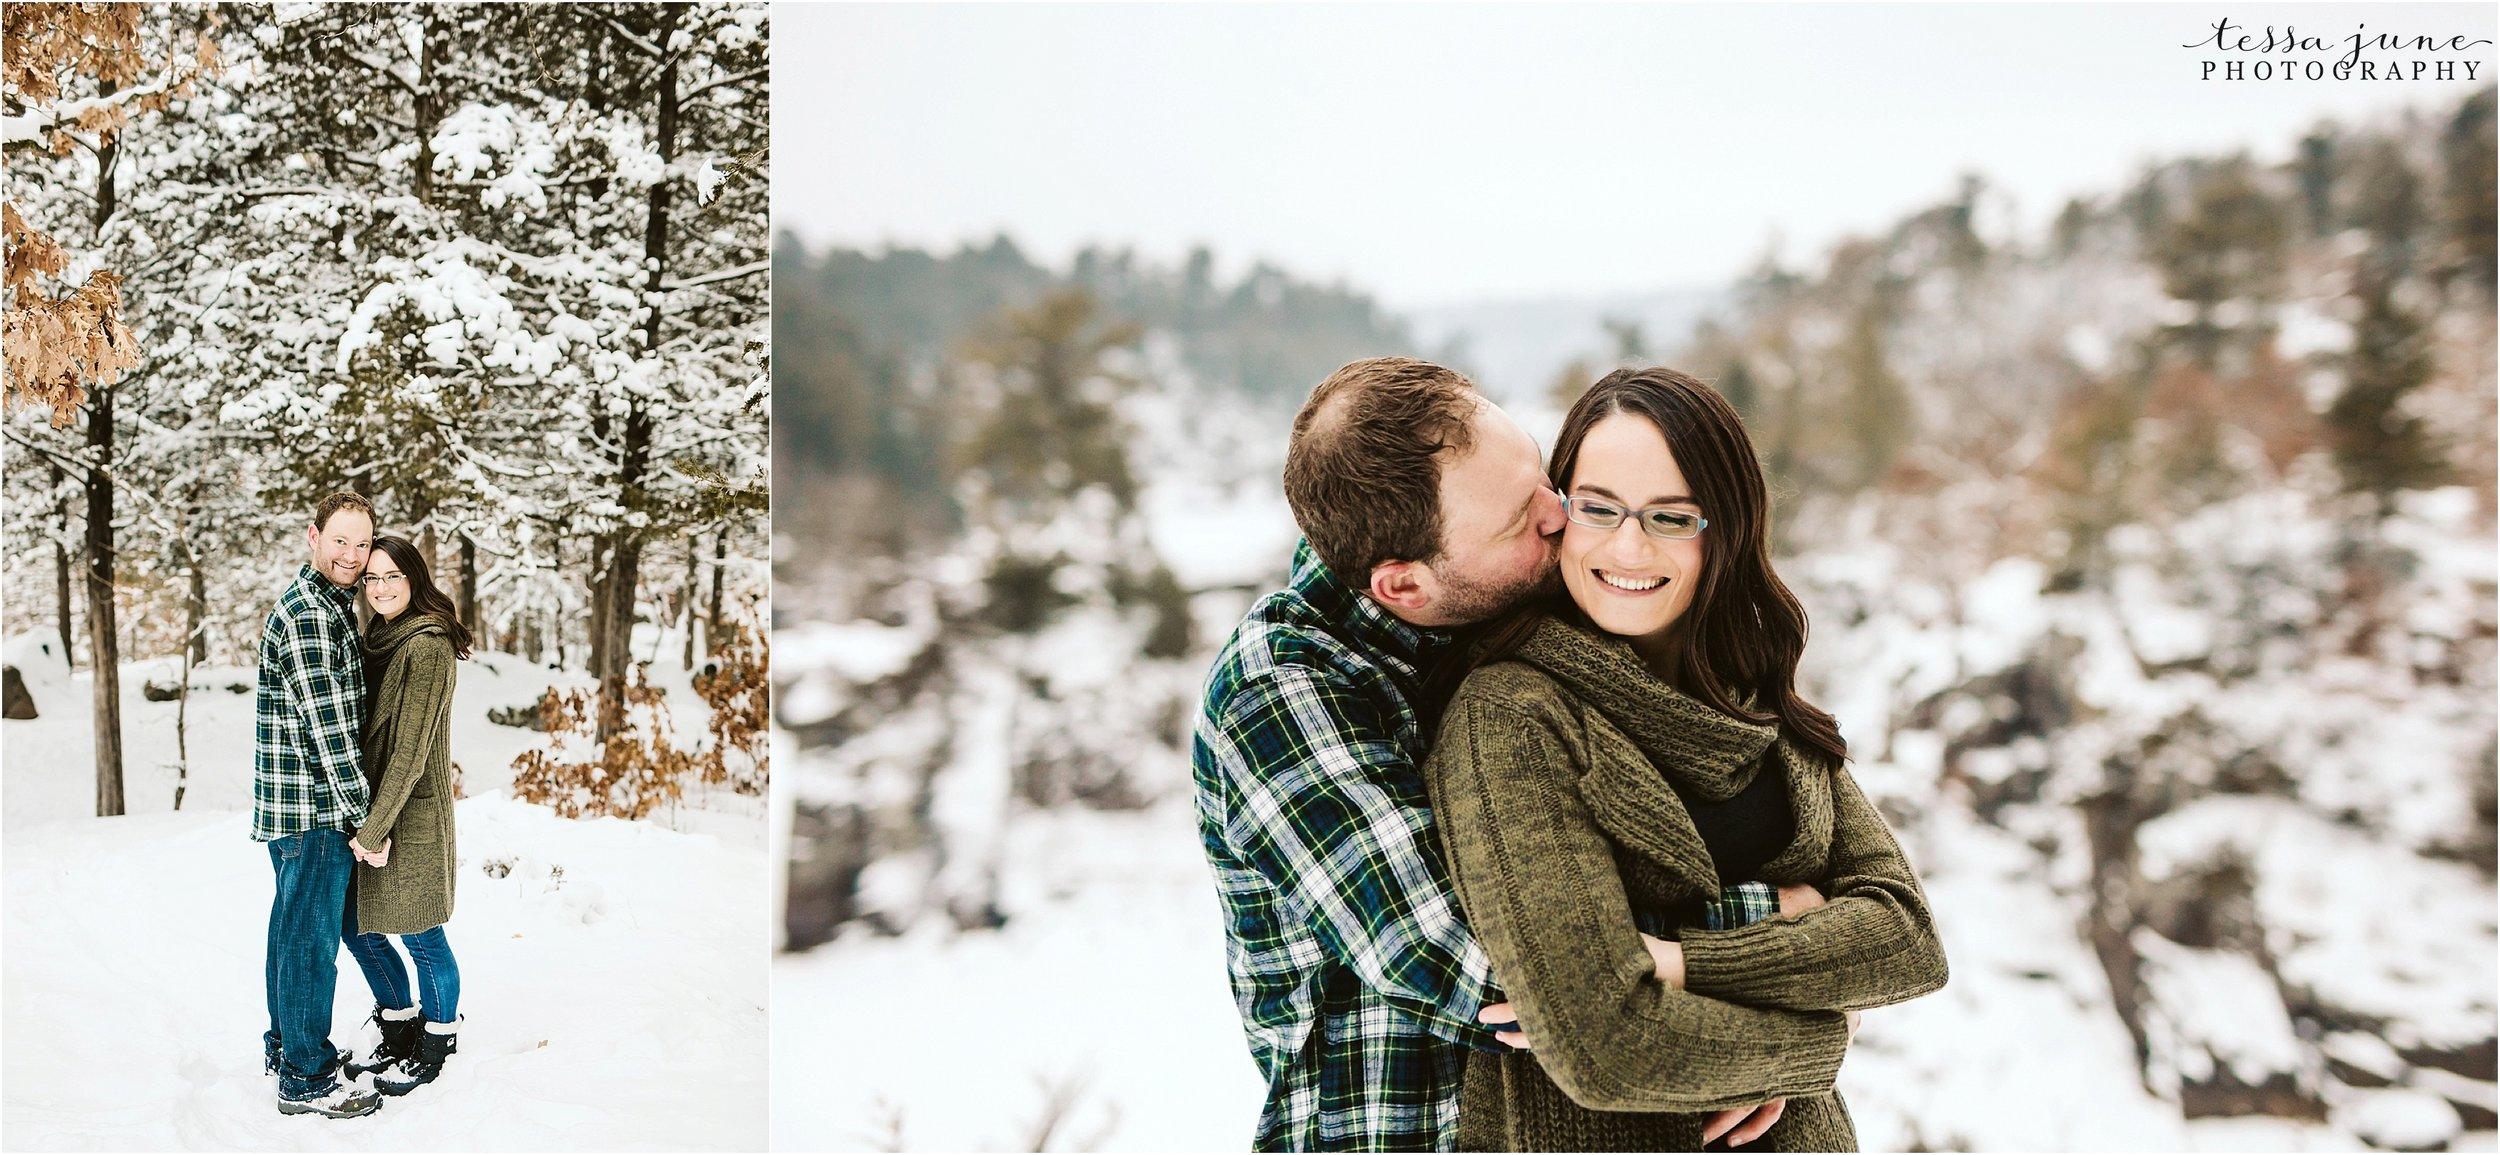 taylors-falls-winter-engagement-session-st-cloud-photographer-29.jpg